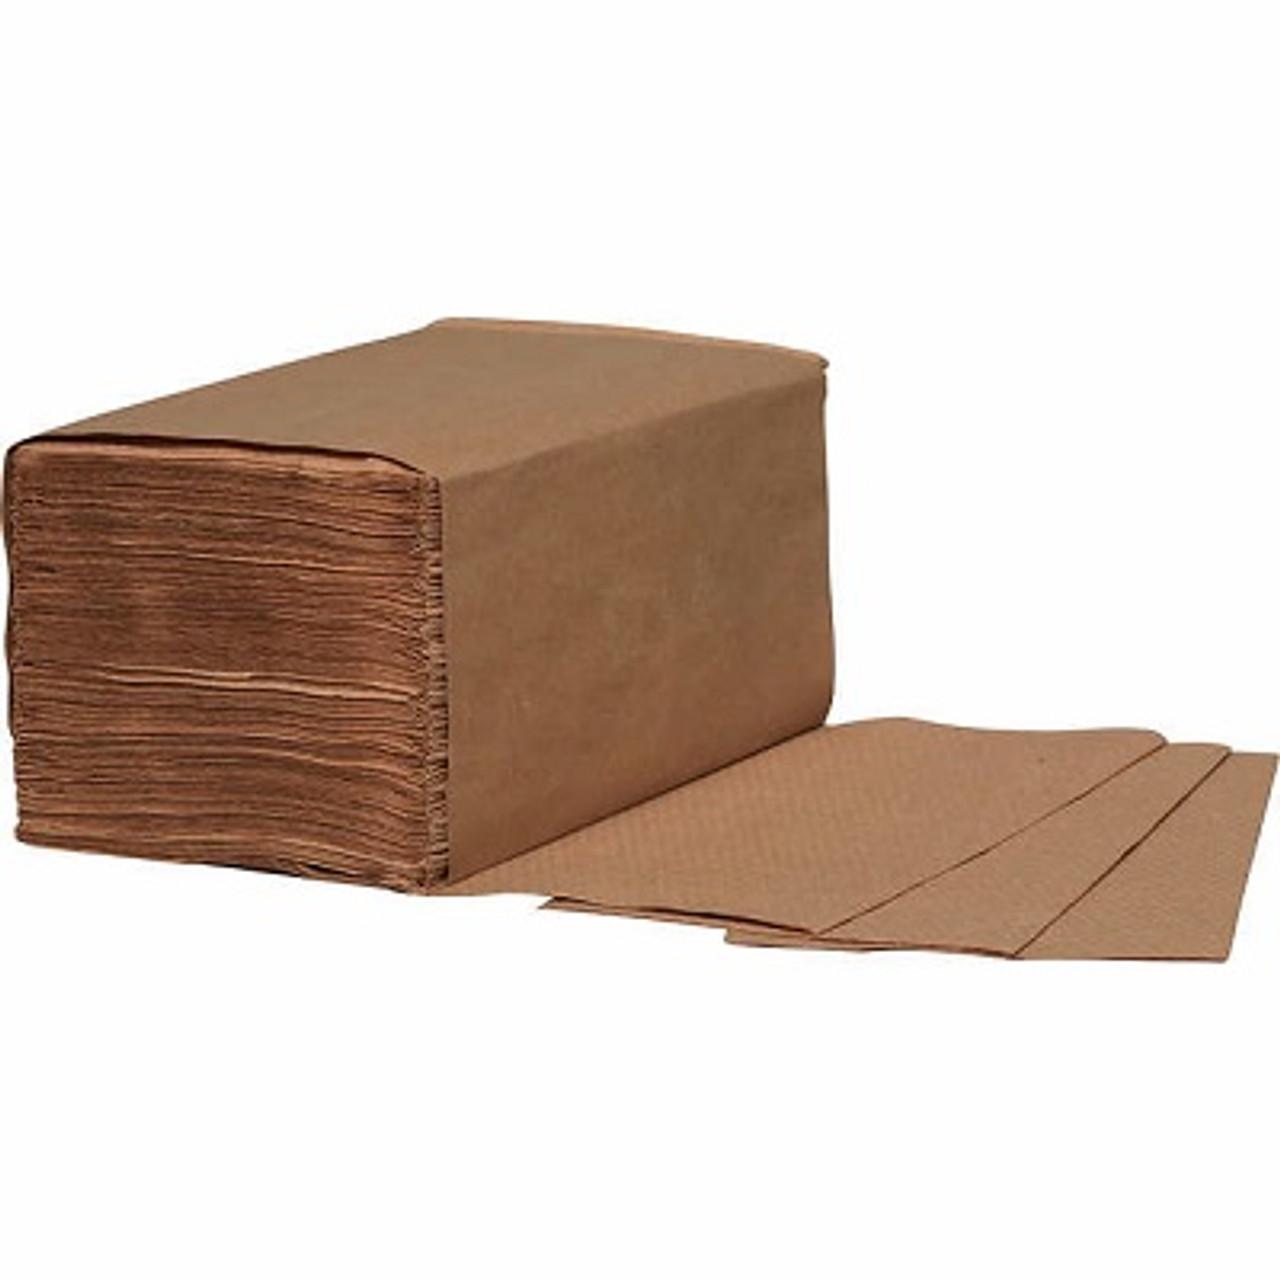 Kraft SingleFold Paper Towels